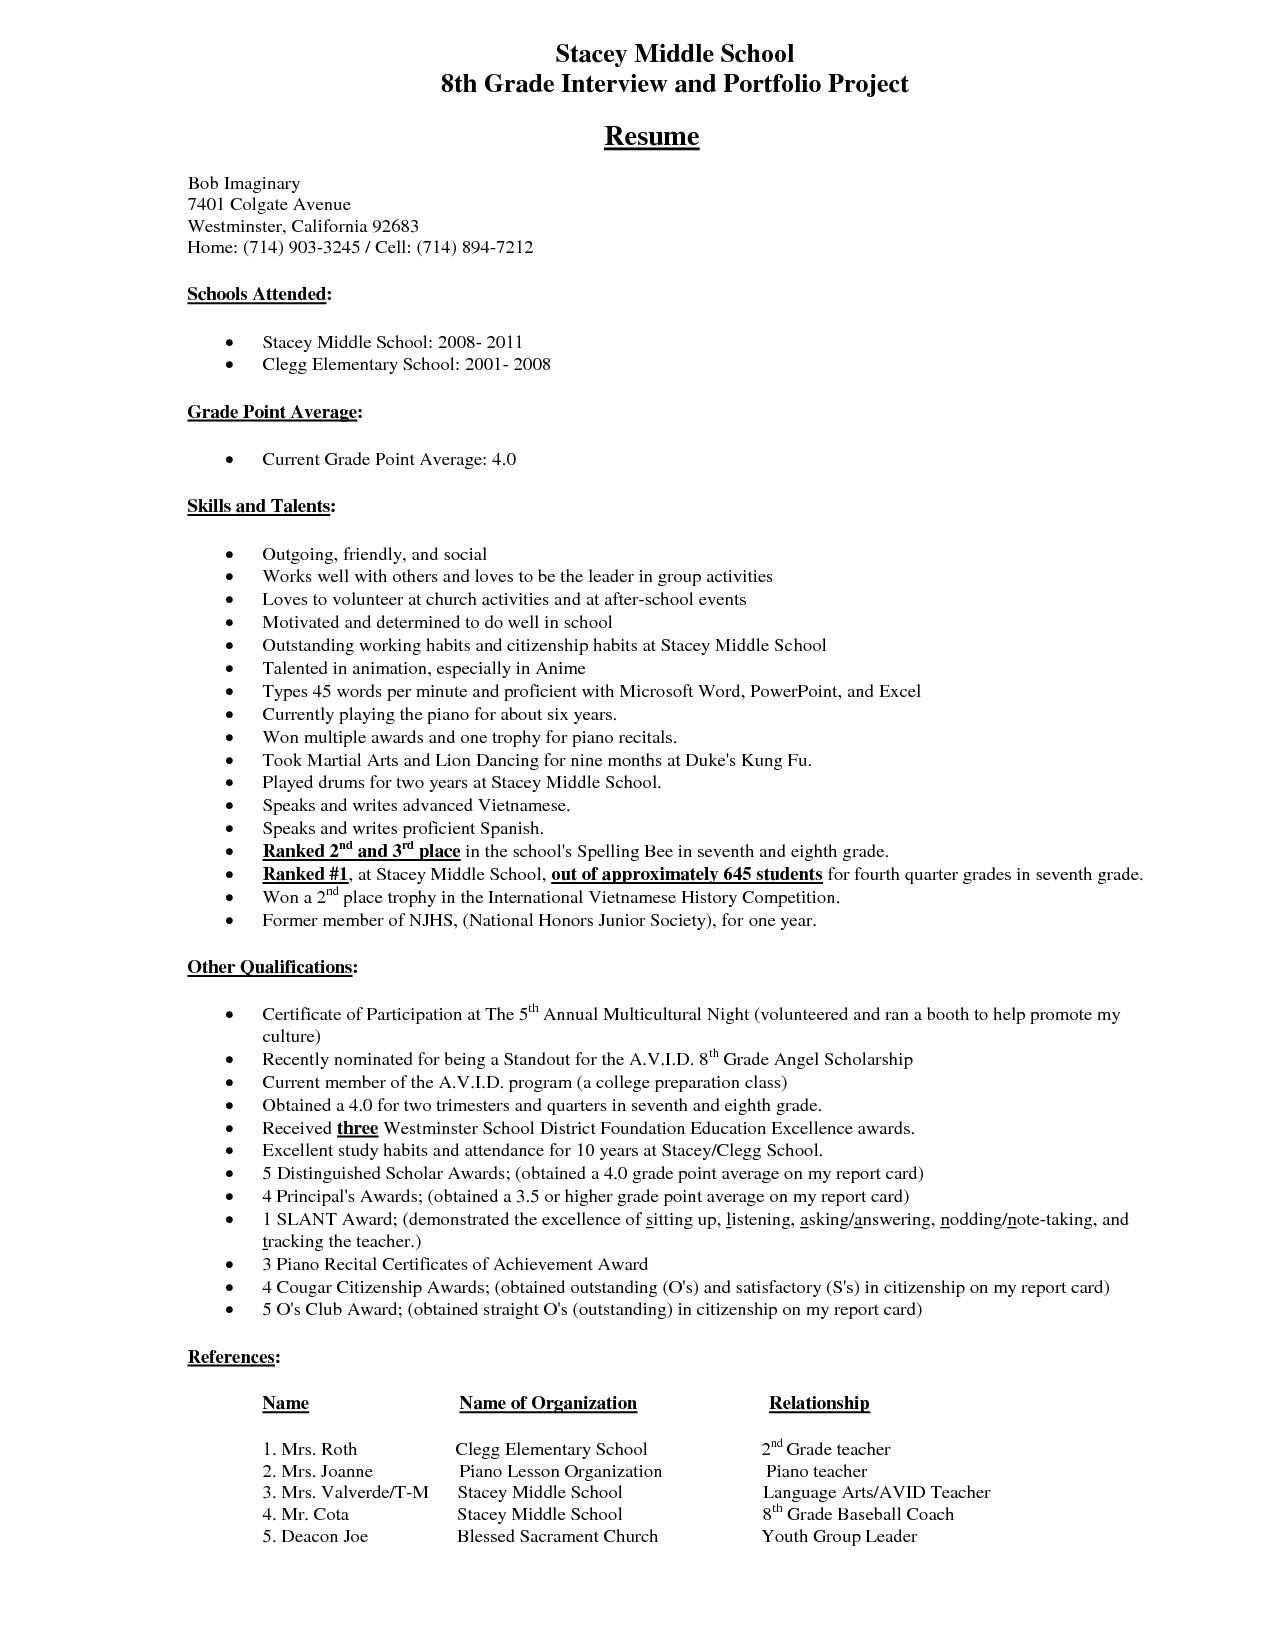 Academic Resume Template High School